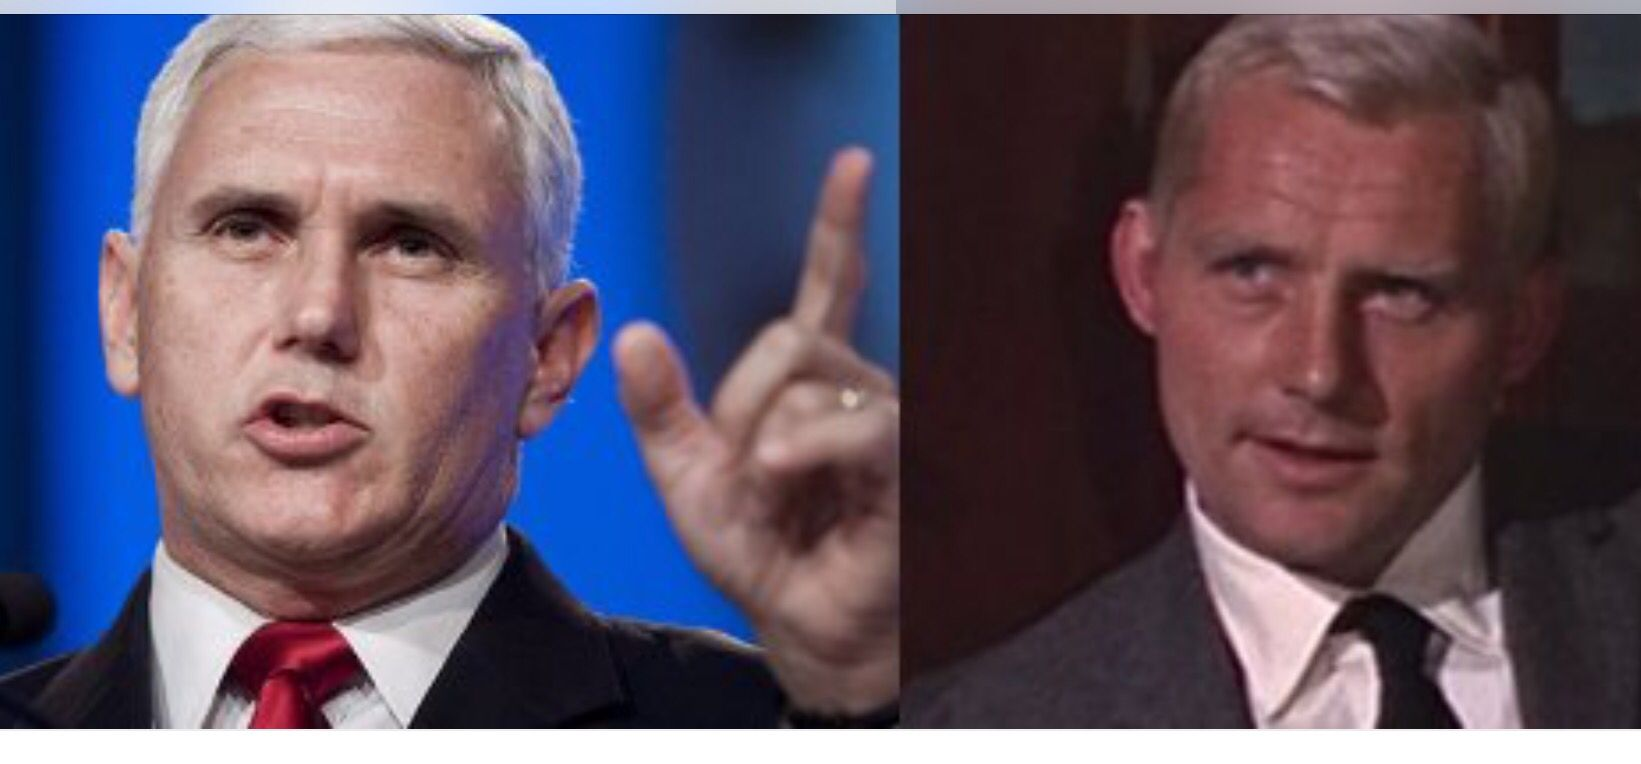 Mike Pence looks like villains